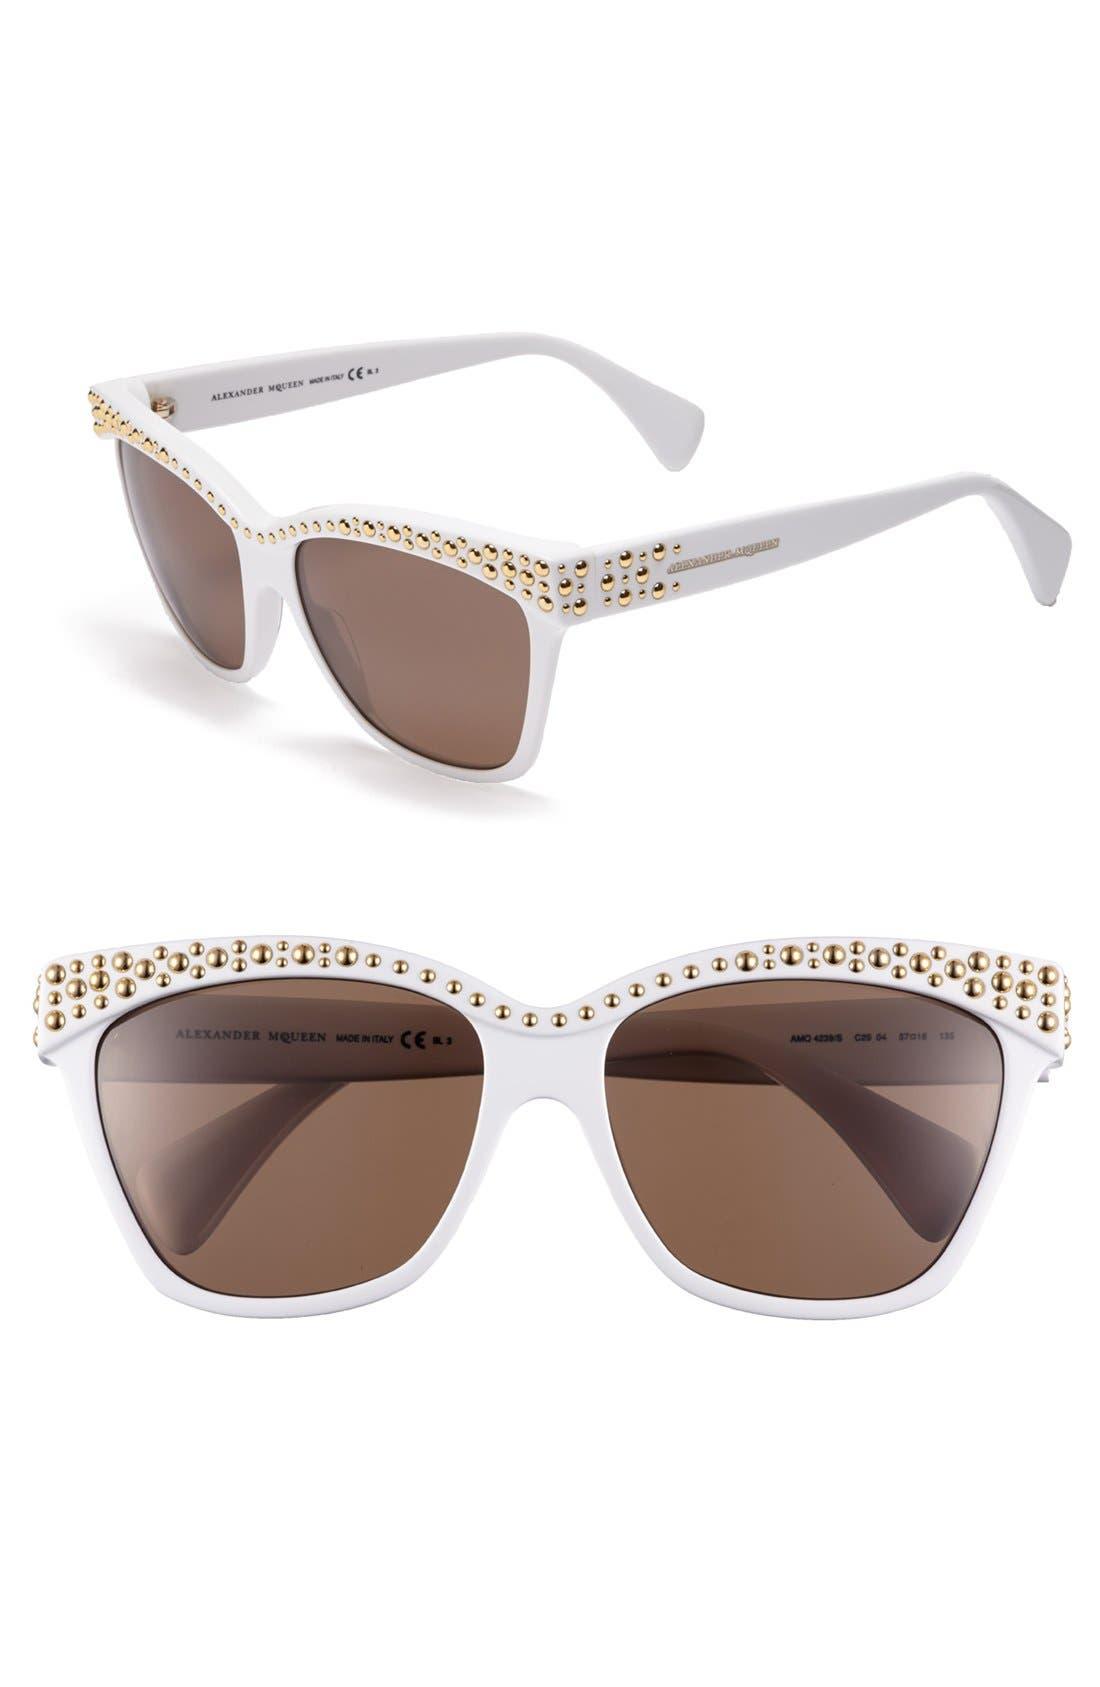 Alternate Image 1 Selected - Alexander McQueen 57mm Studded Sunglasses